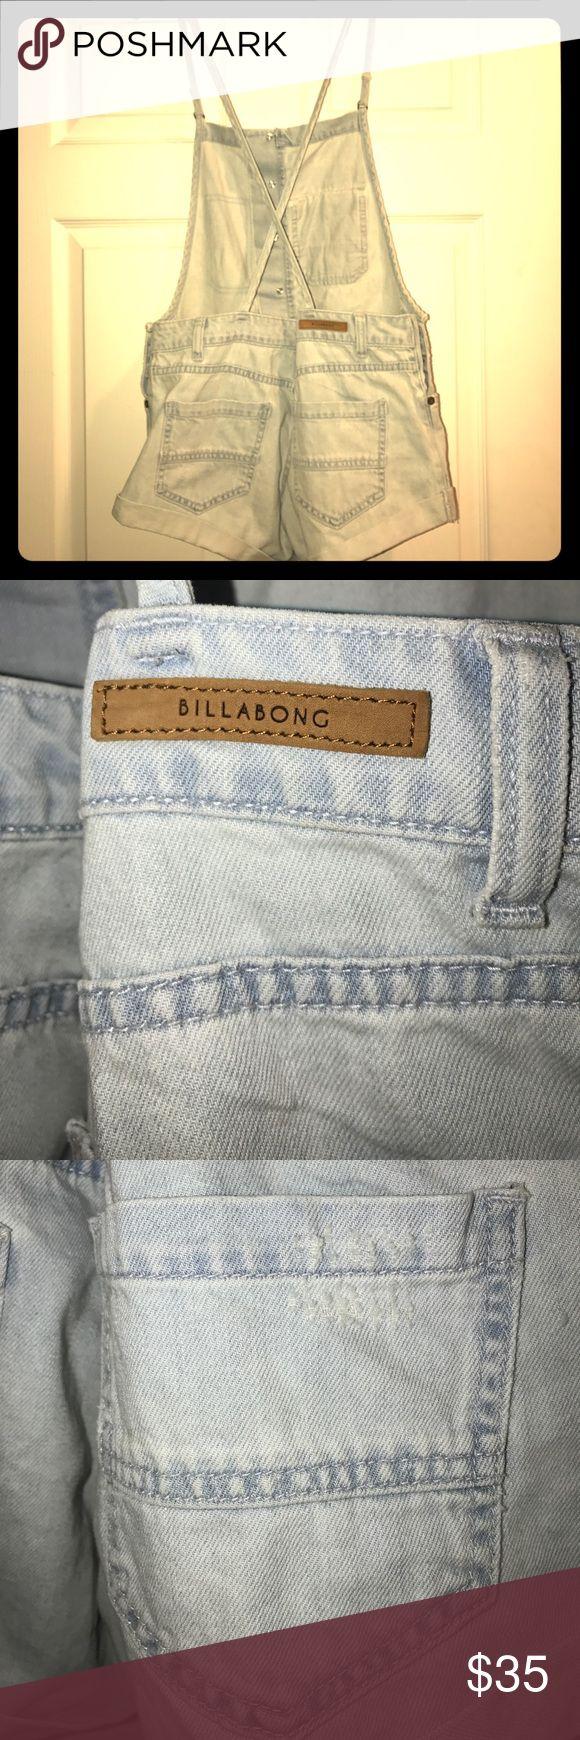 BILLABONG short overalls Super beachy Billabong short overalls in stonewashed denim. Billabong Shorts Jean Shorts